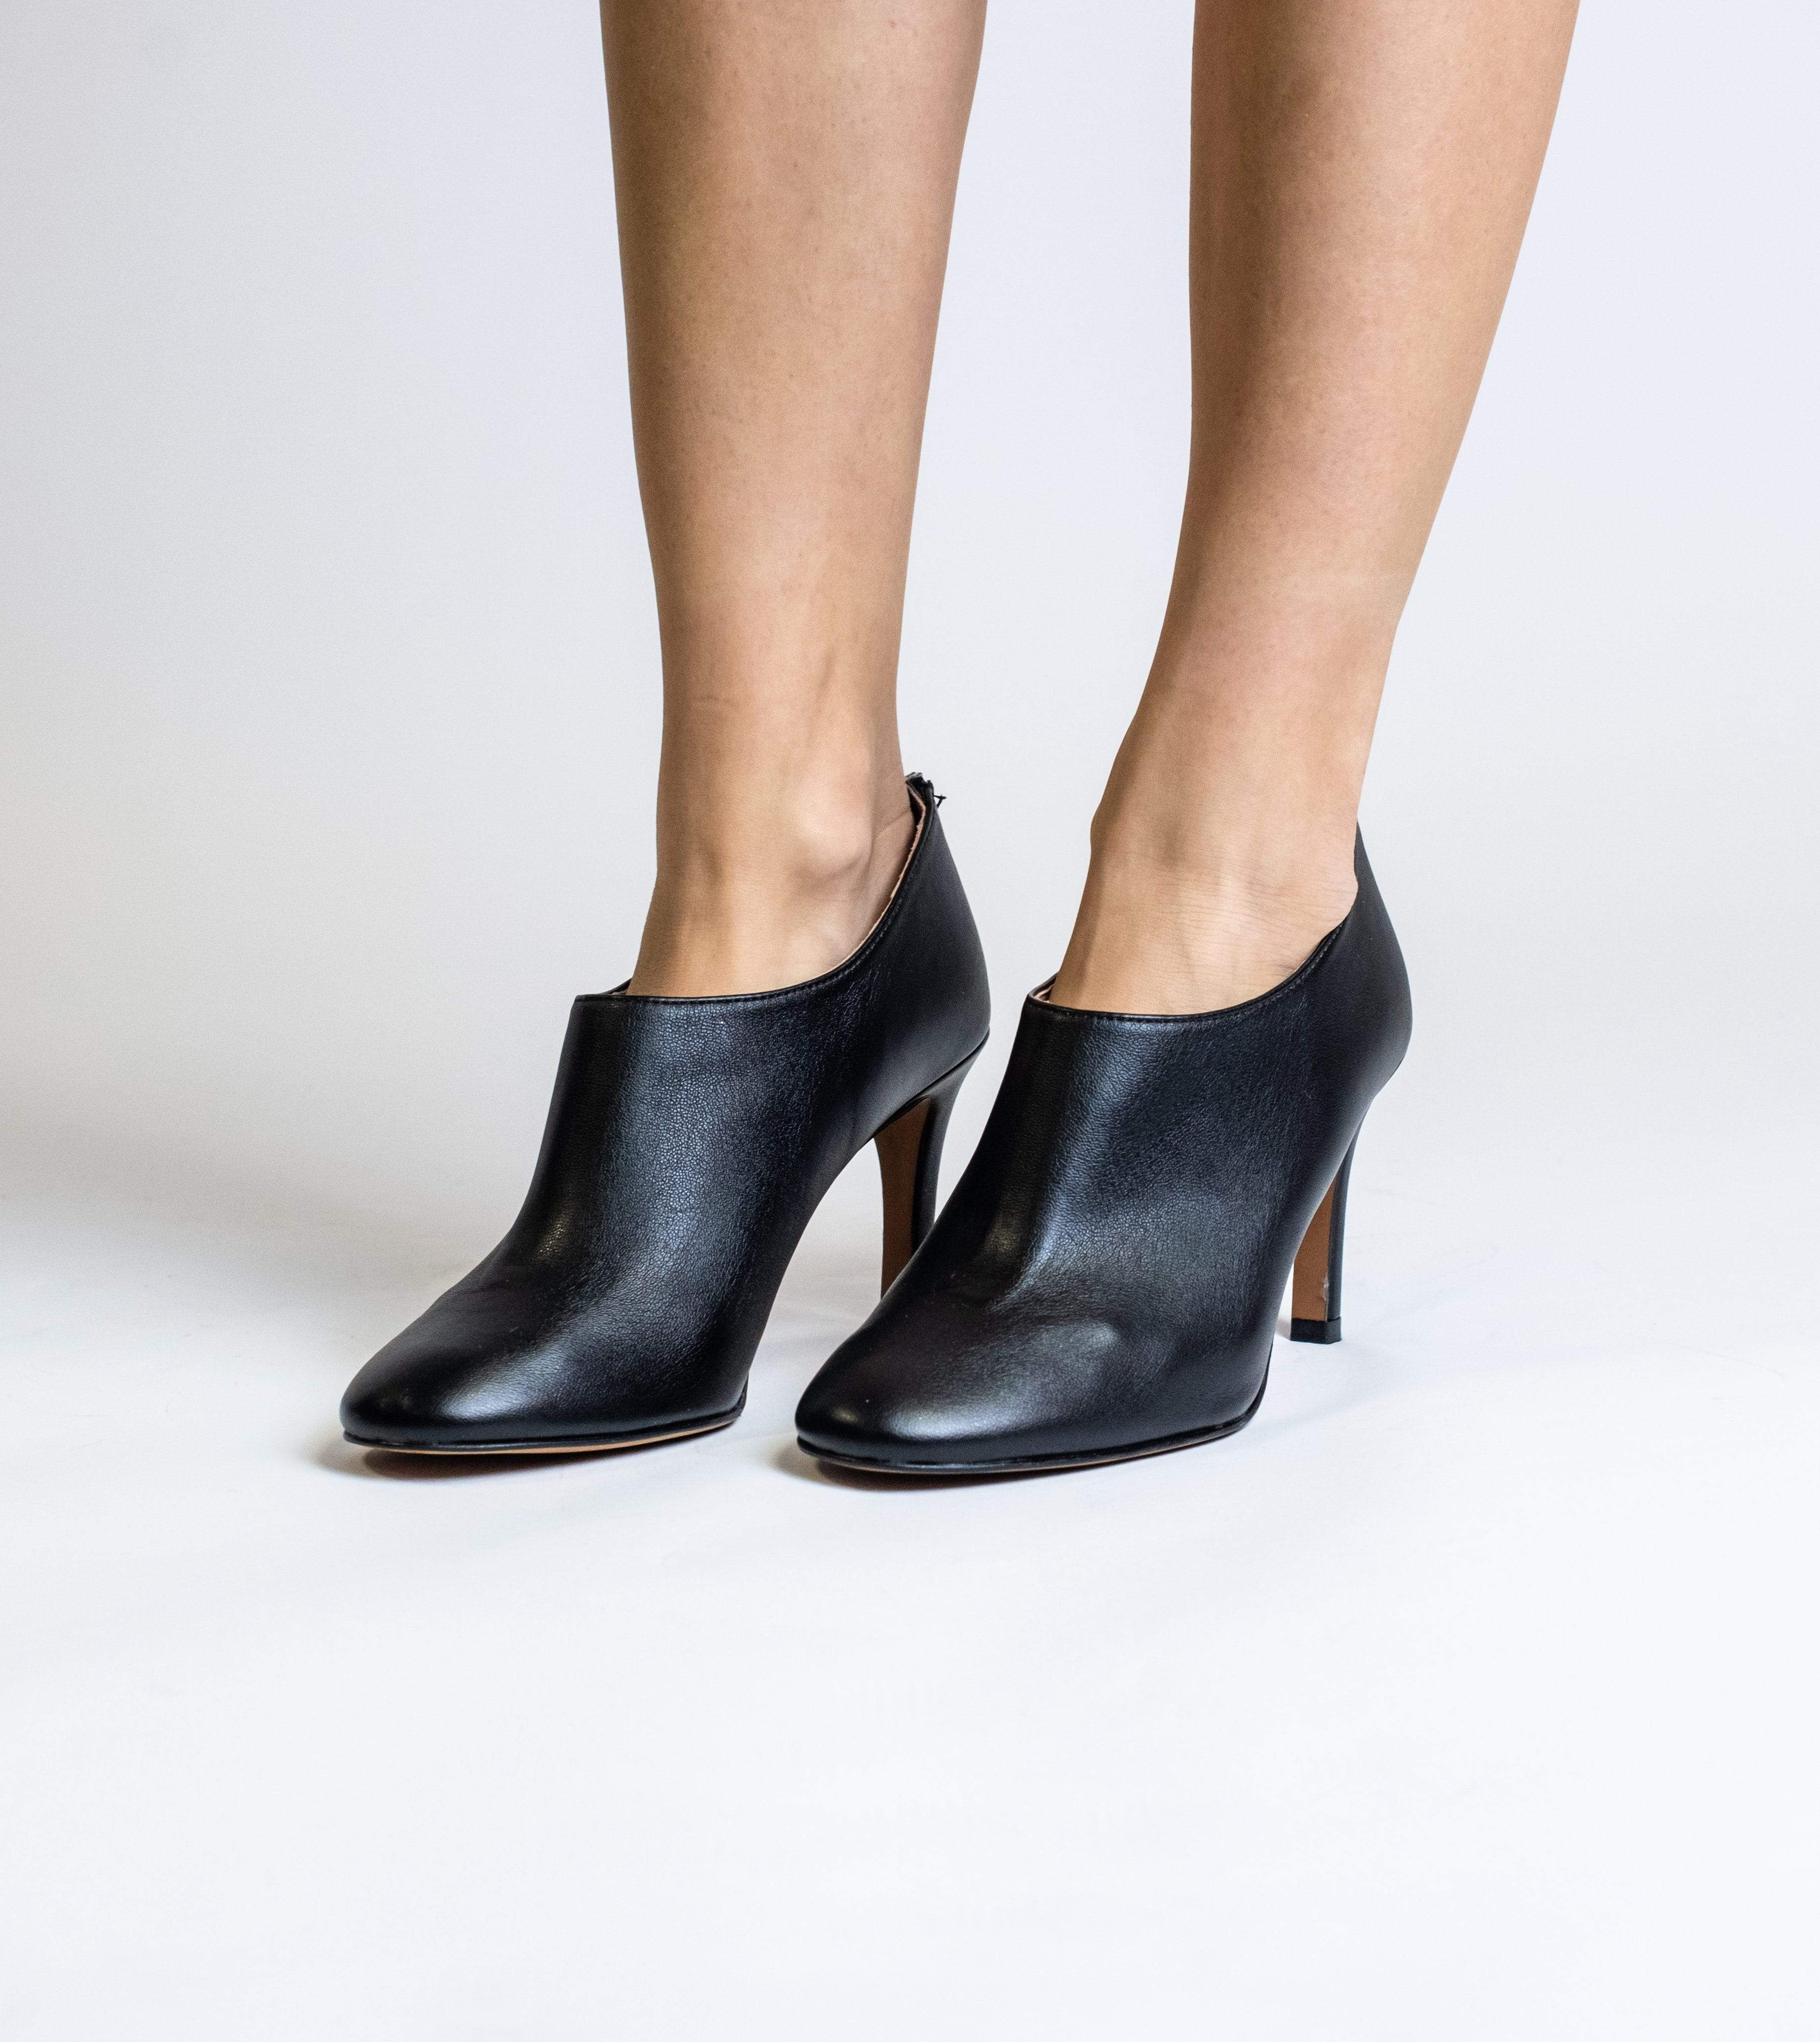 Allkind Olivia Vegan Leather Heeled Boots   Black